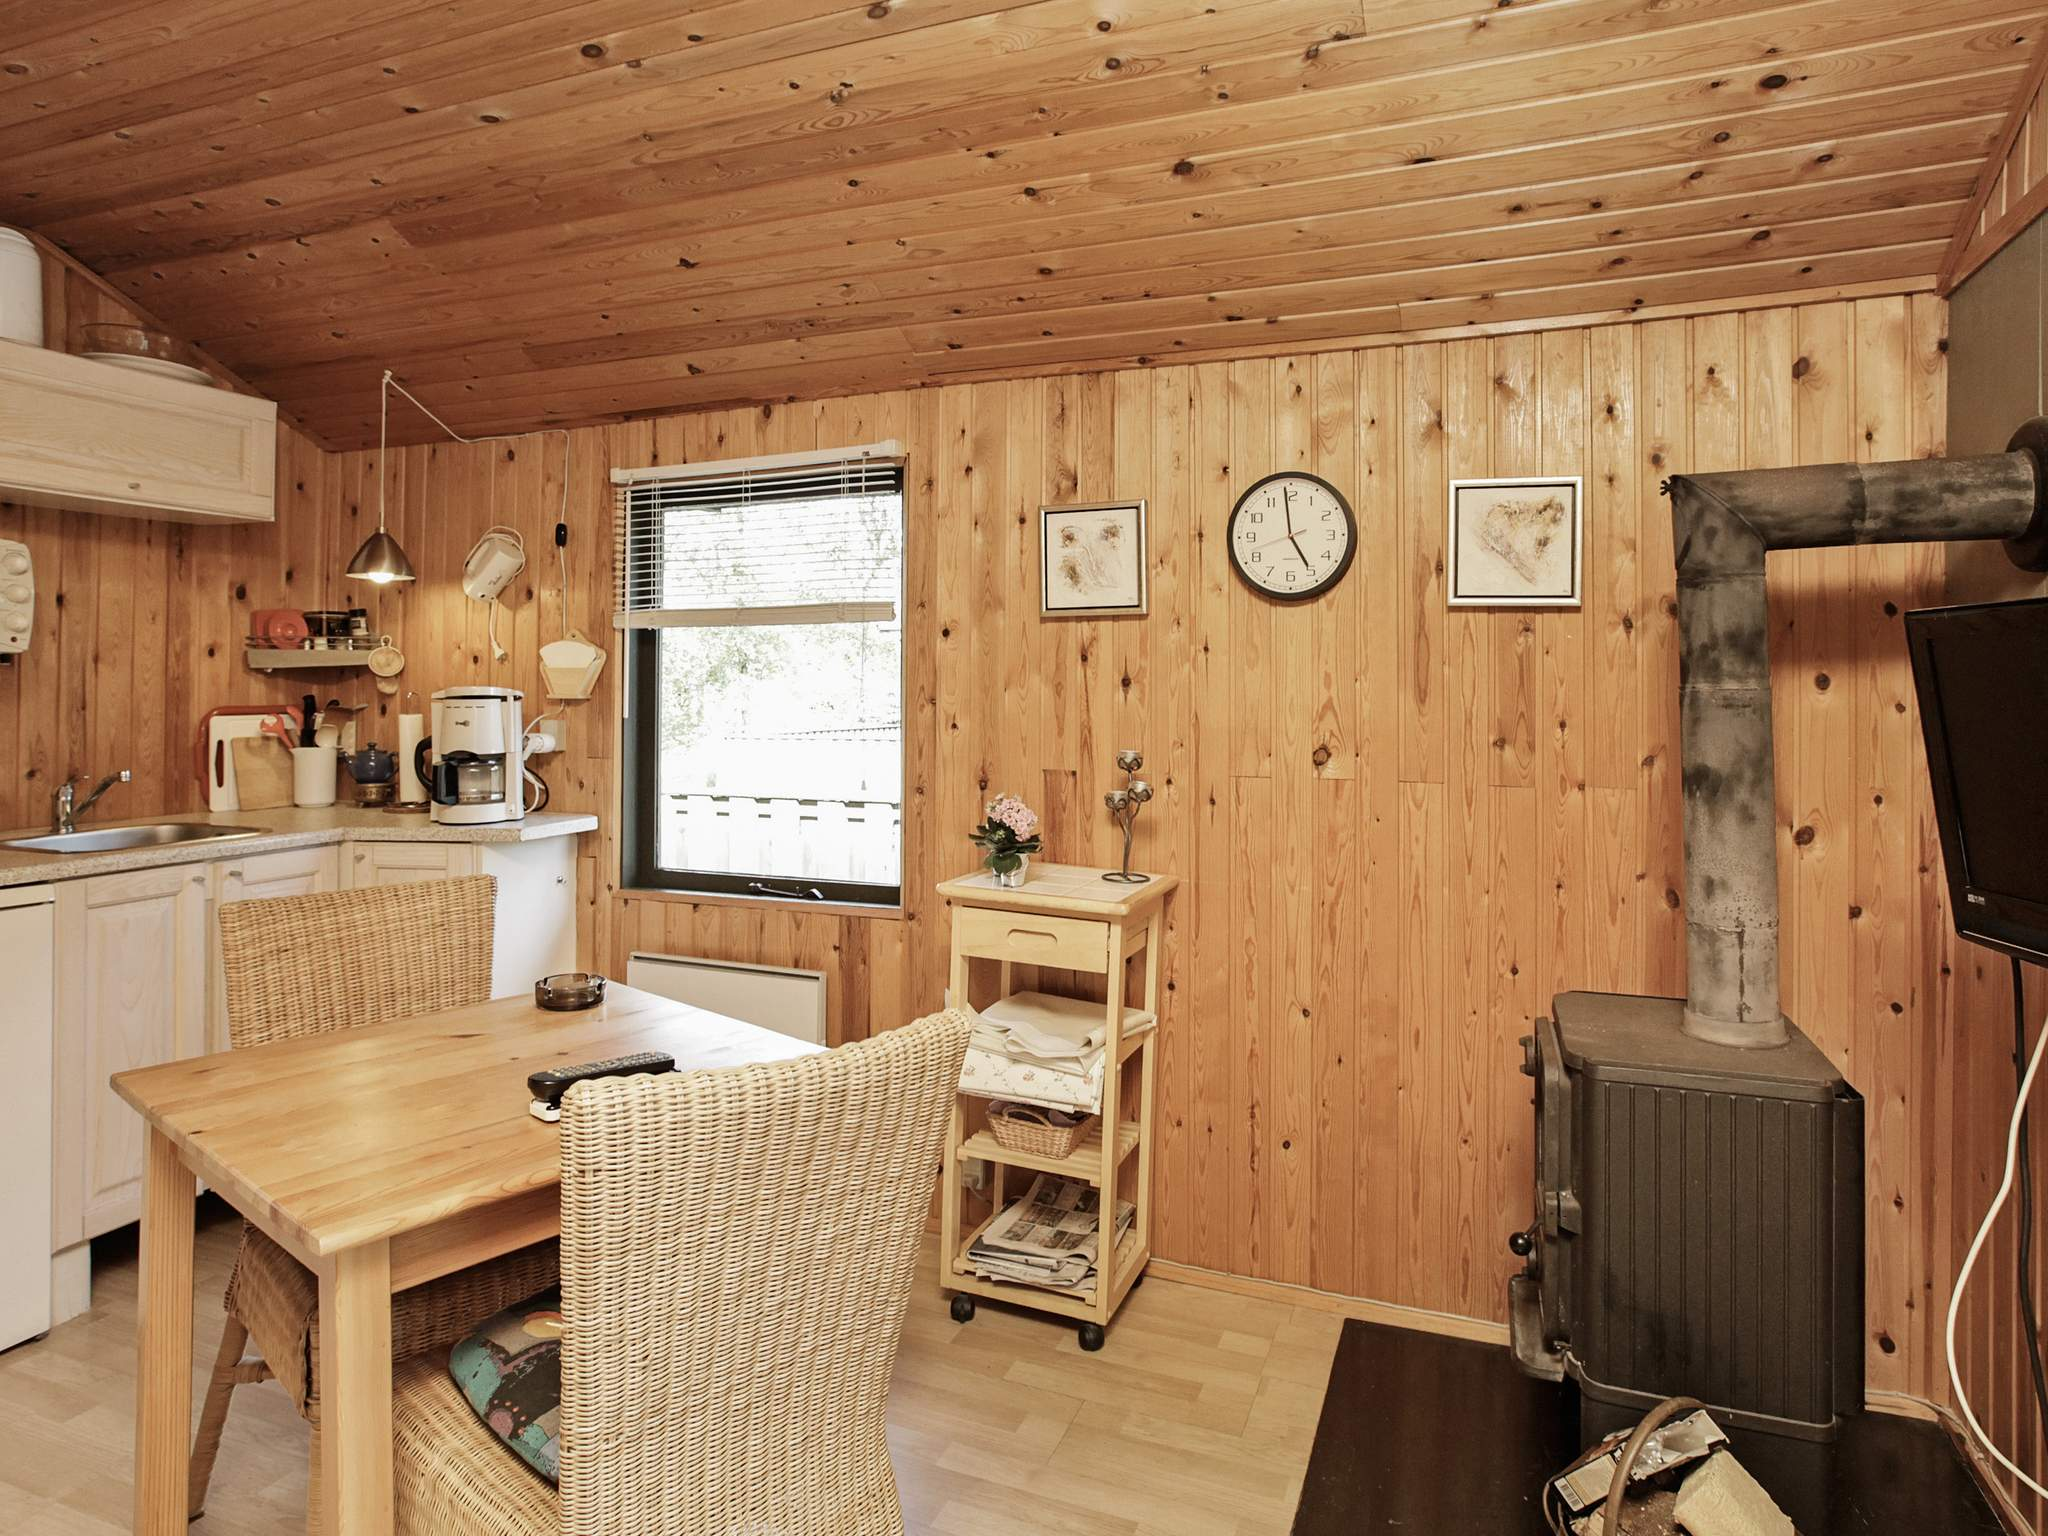 Ferienhaus Hou/Lagunen (84779), Hou, , Dänische Ostsee, Dänemark, Bild 7